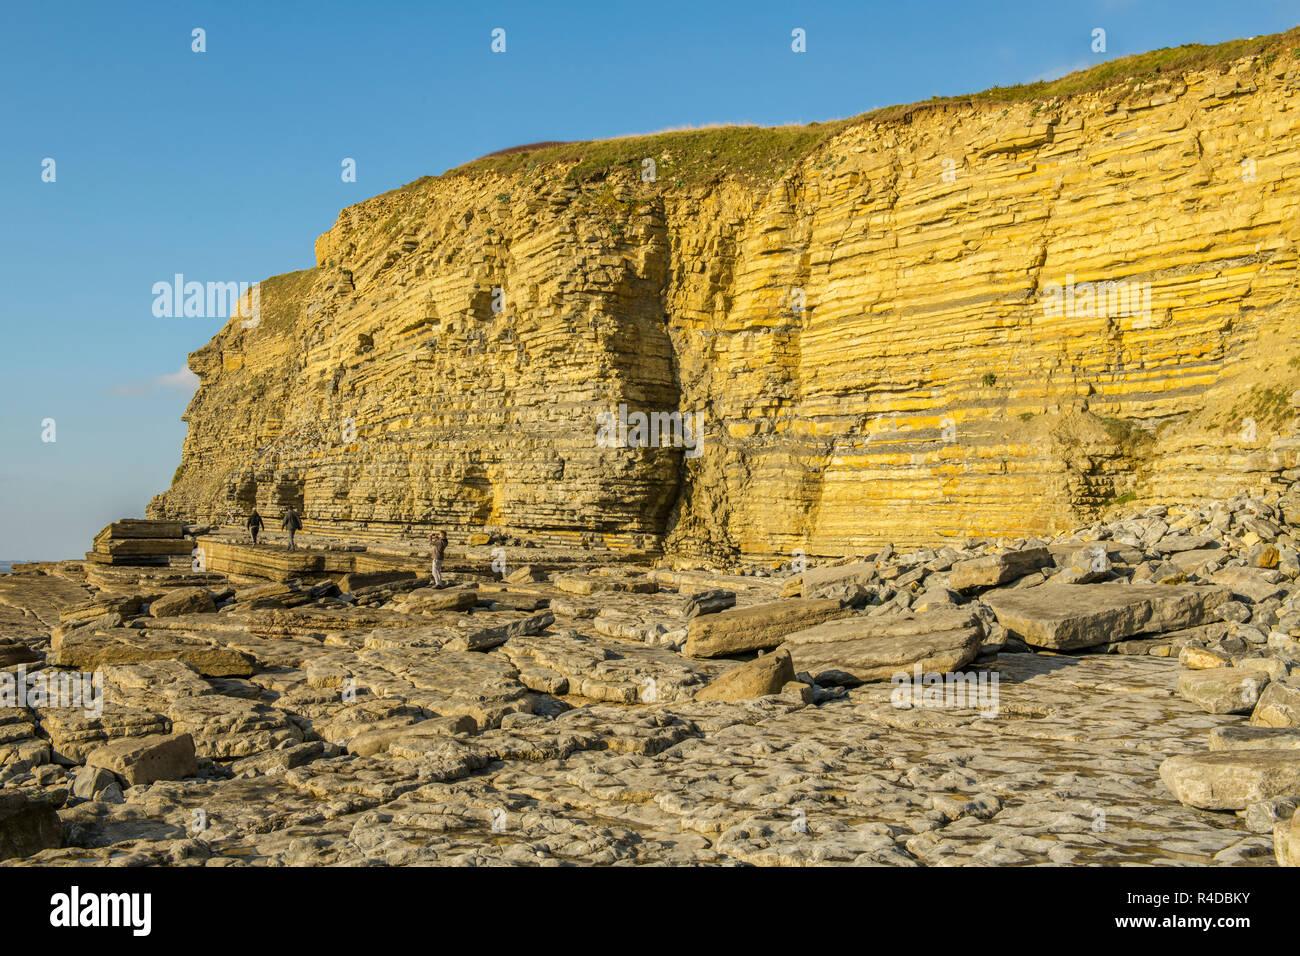 Limestone Cliffs at Dunraven Bay Southerndown Vale of Glamorgan - Stock Image